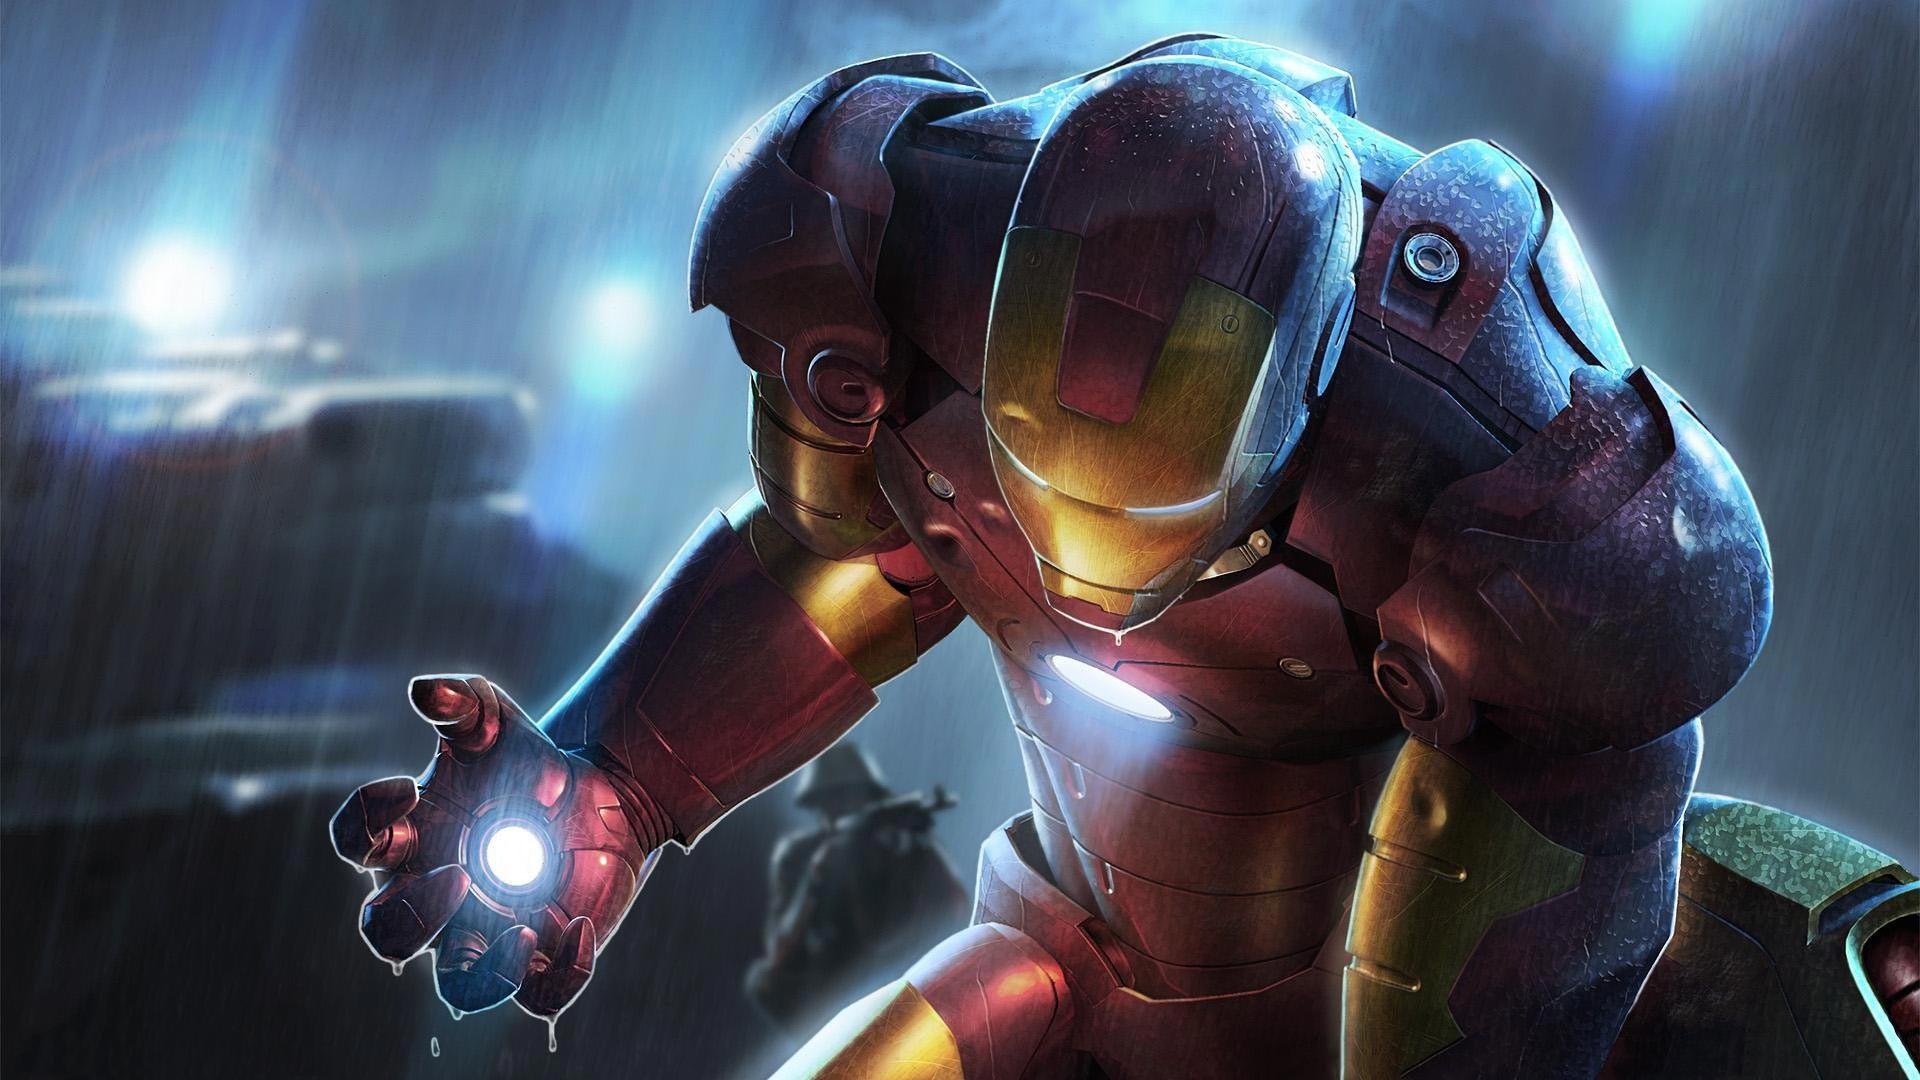 Iron-Man-2-HD-Superhero-Film-Wallpaper-by-